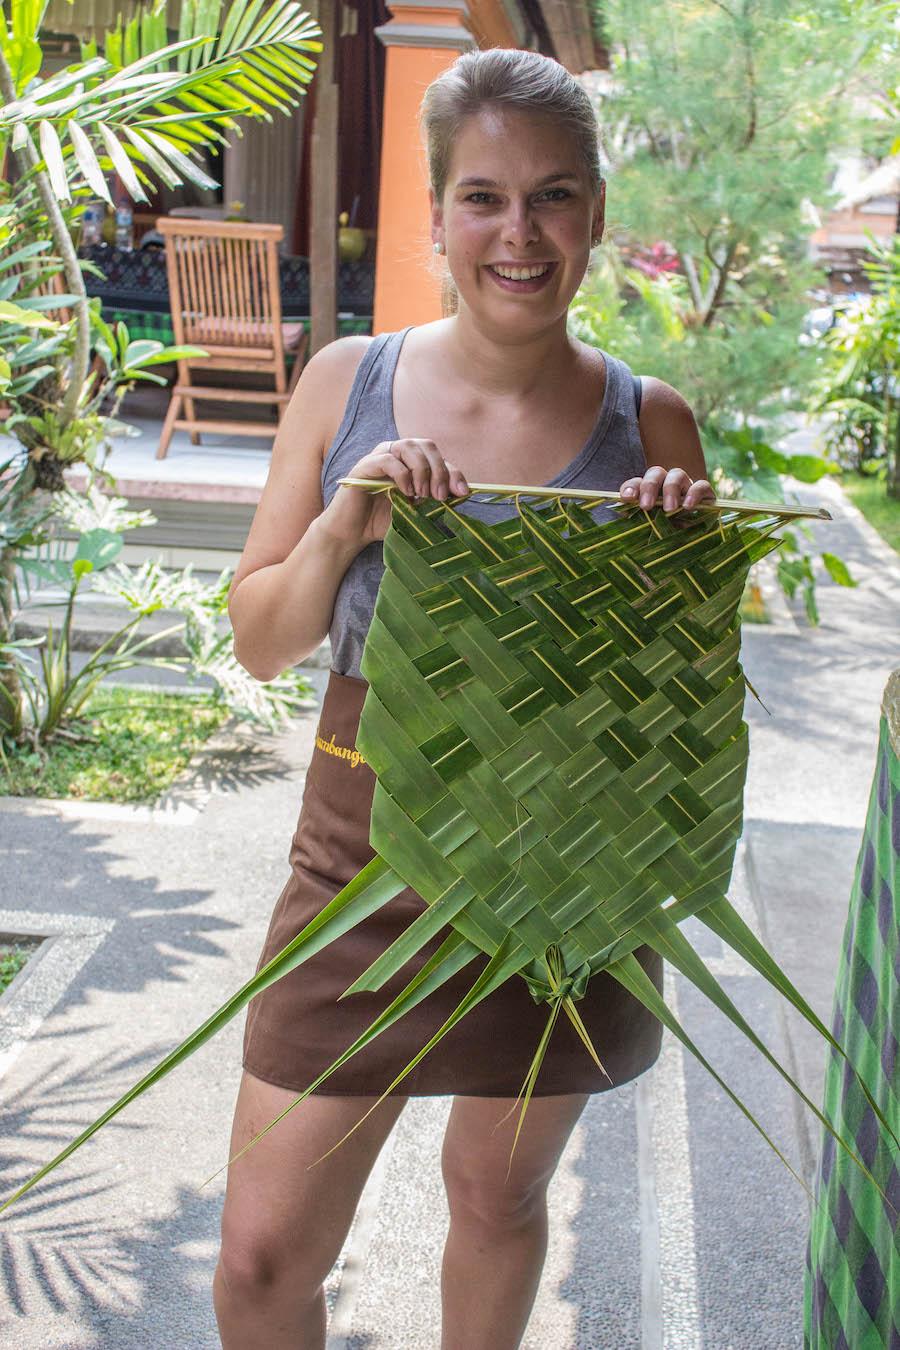 Kochkurs auf Bali - Bananenblaetter flechten